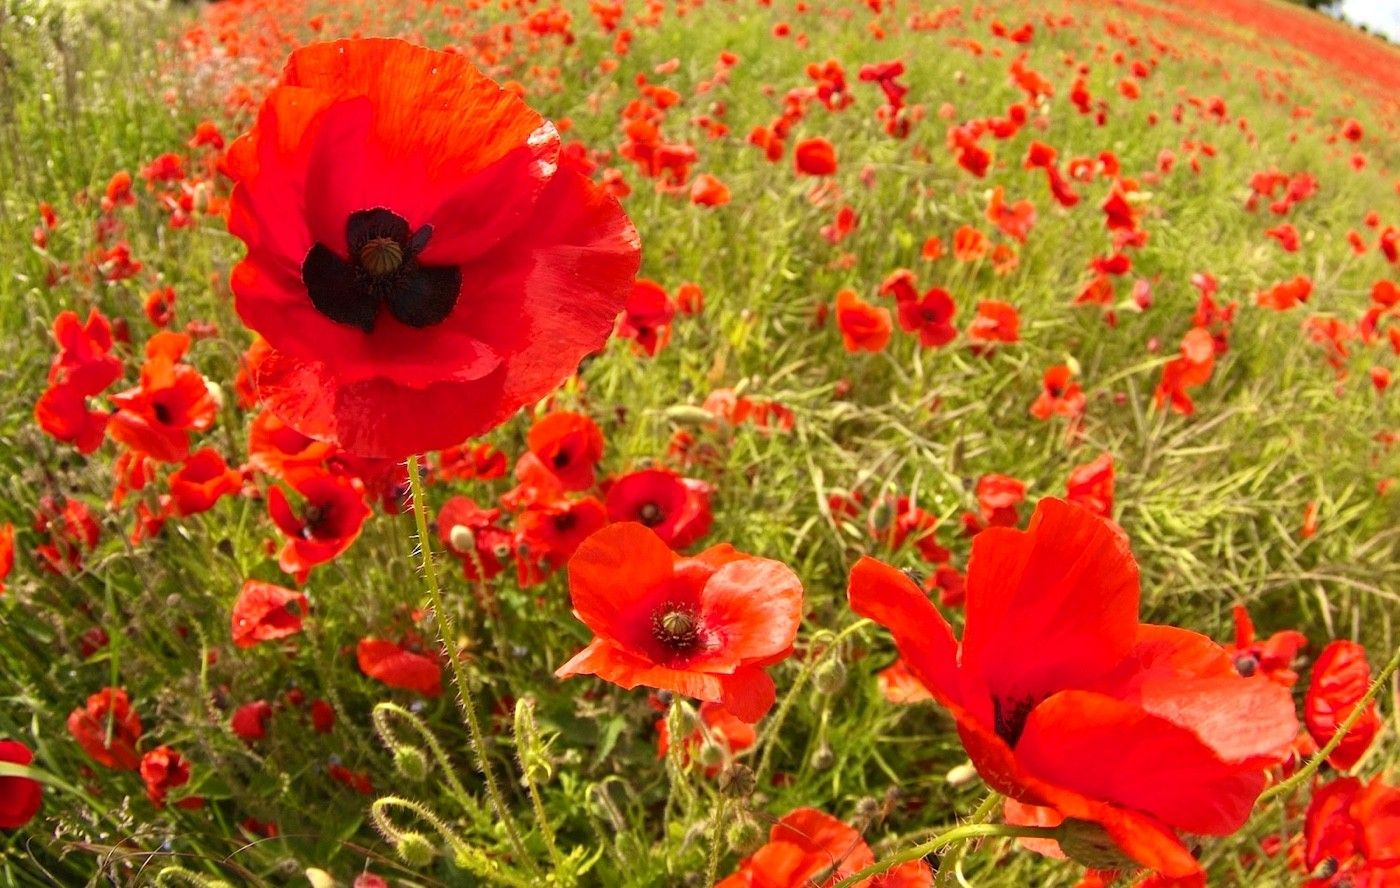 We passed many fields. The poppy fields were the best!